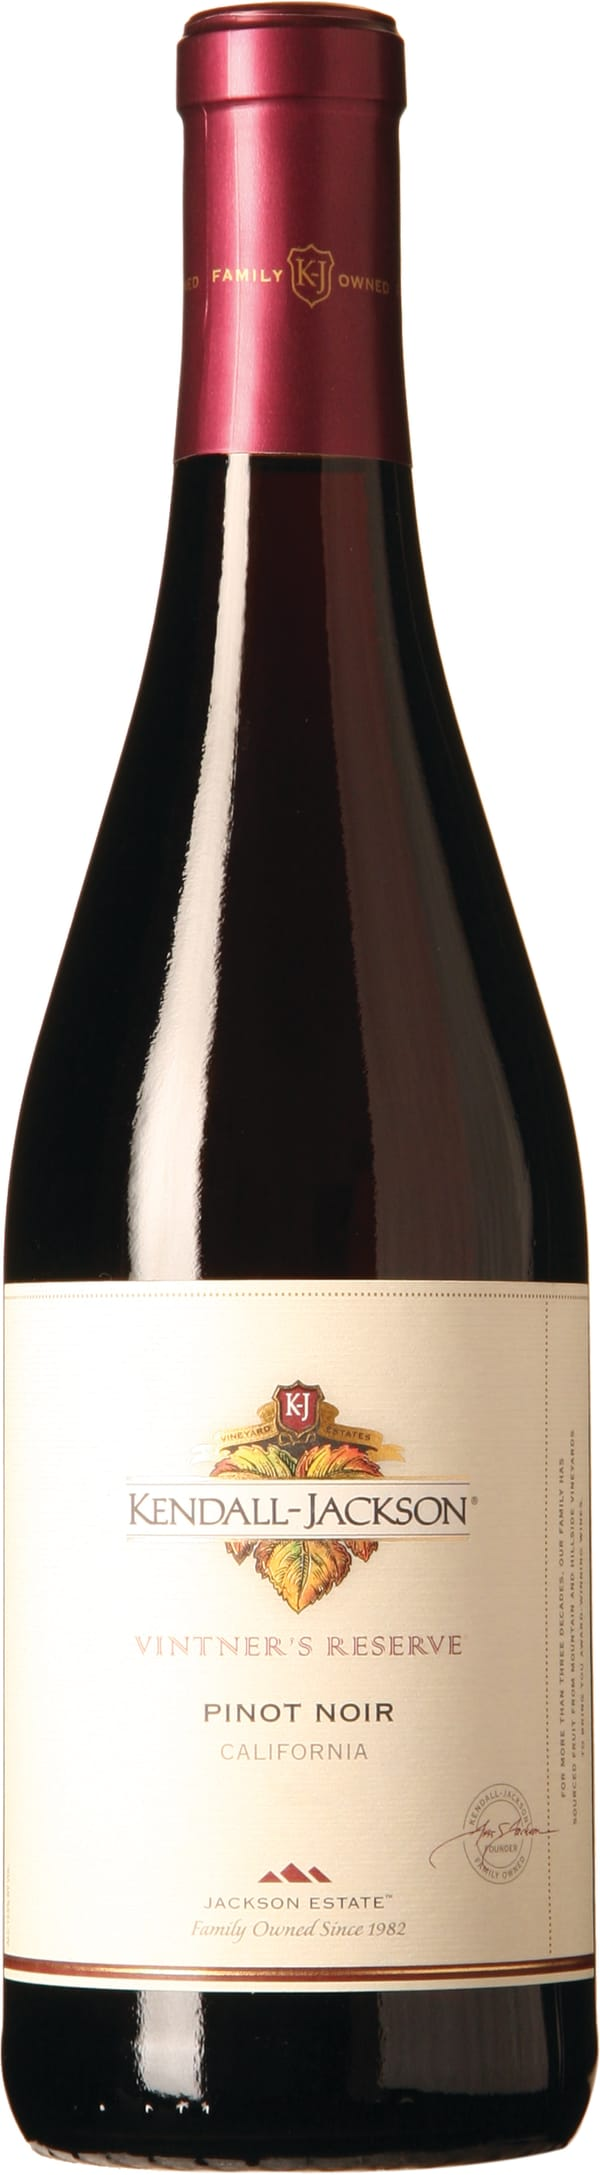 Kendall Jackson Vintners Reserve Pinot Noir 2015